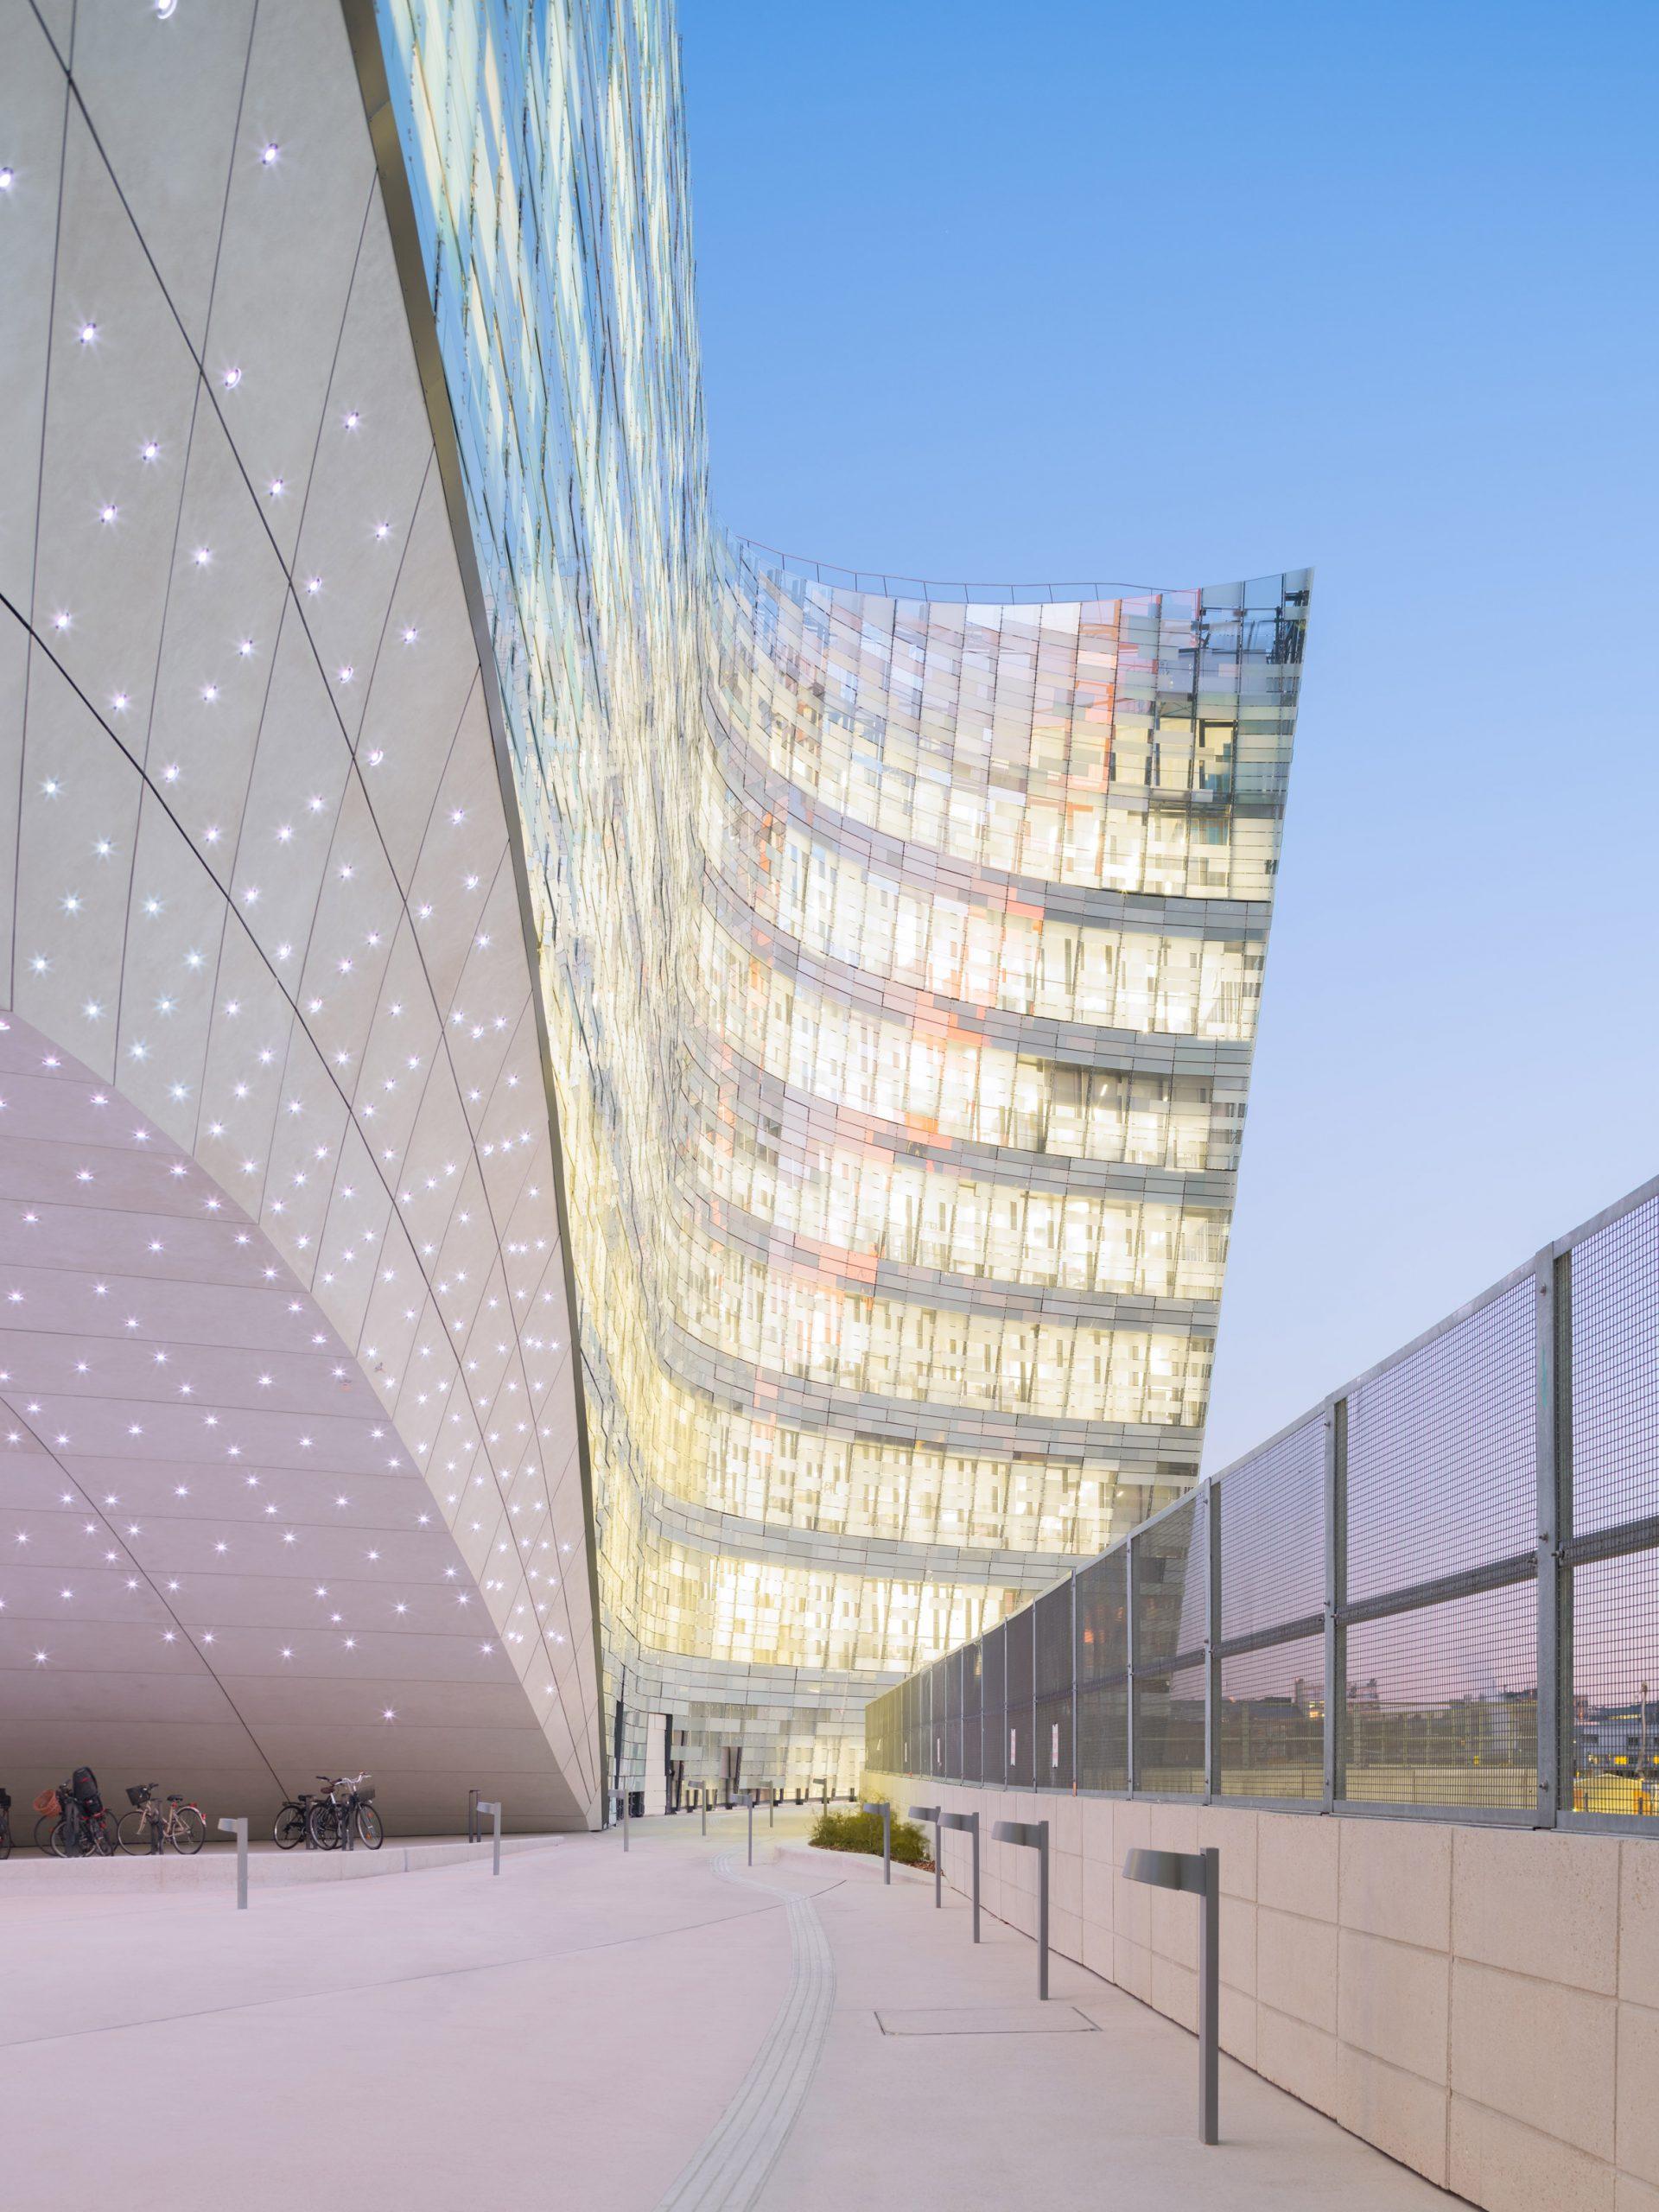 The transparent facade of the Le Monde Headquarters in Paris by Snøhetta